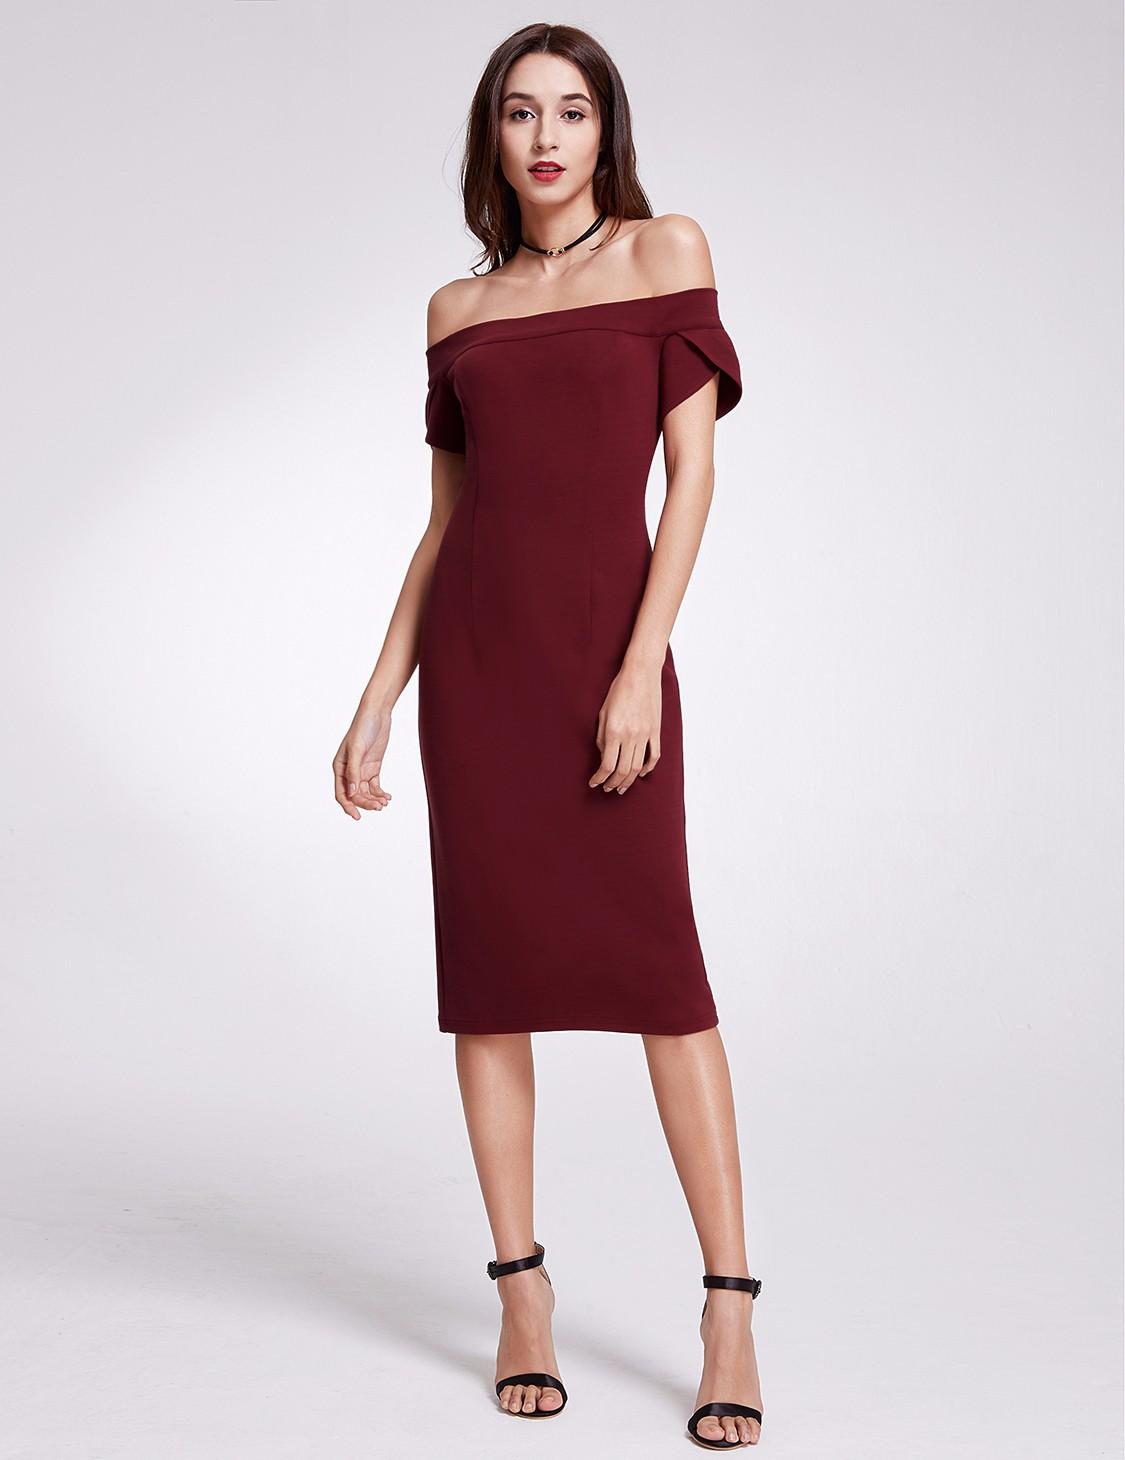 Cocktail Dresses (18)